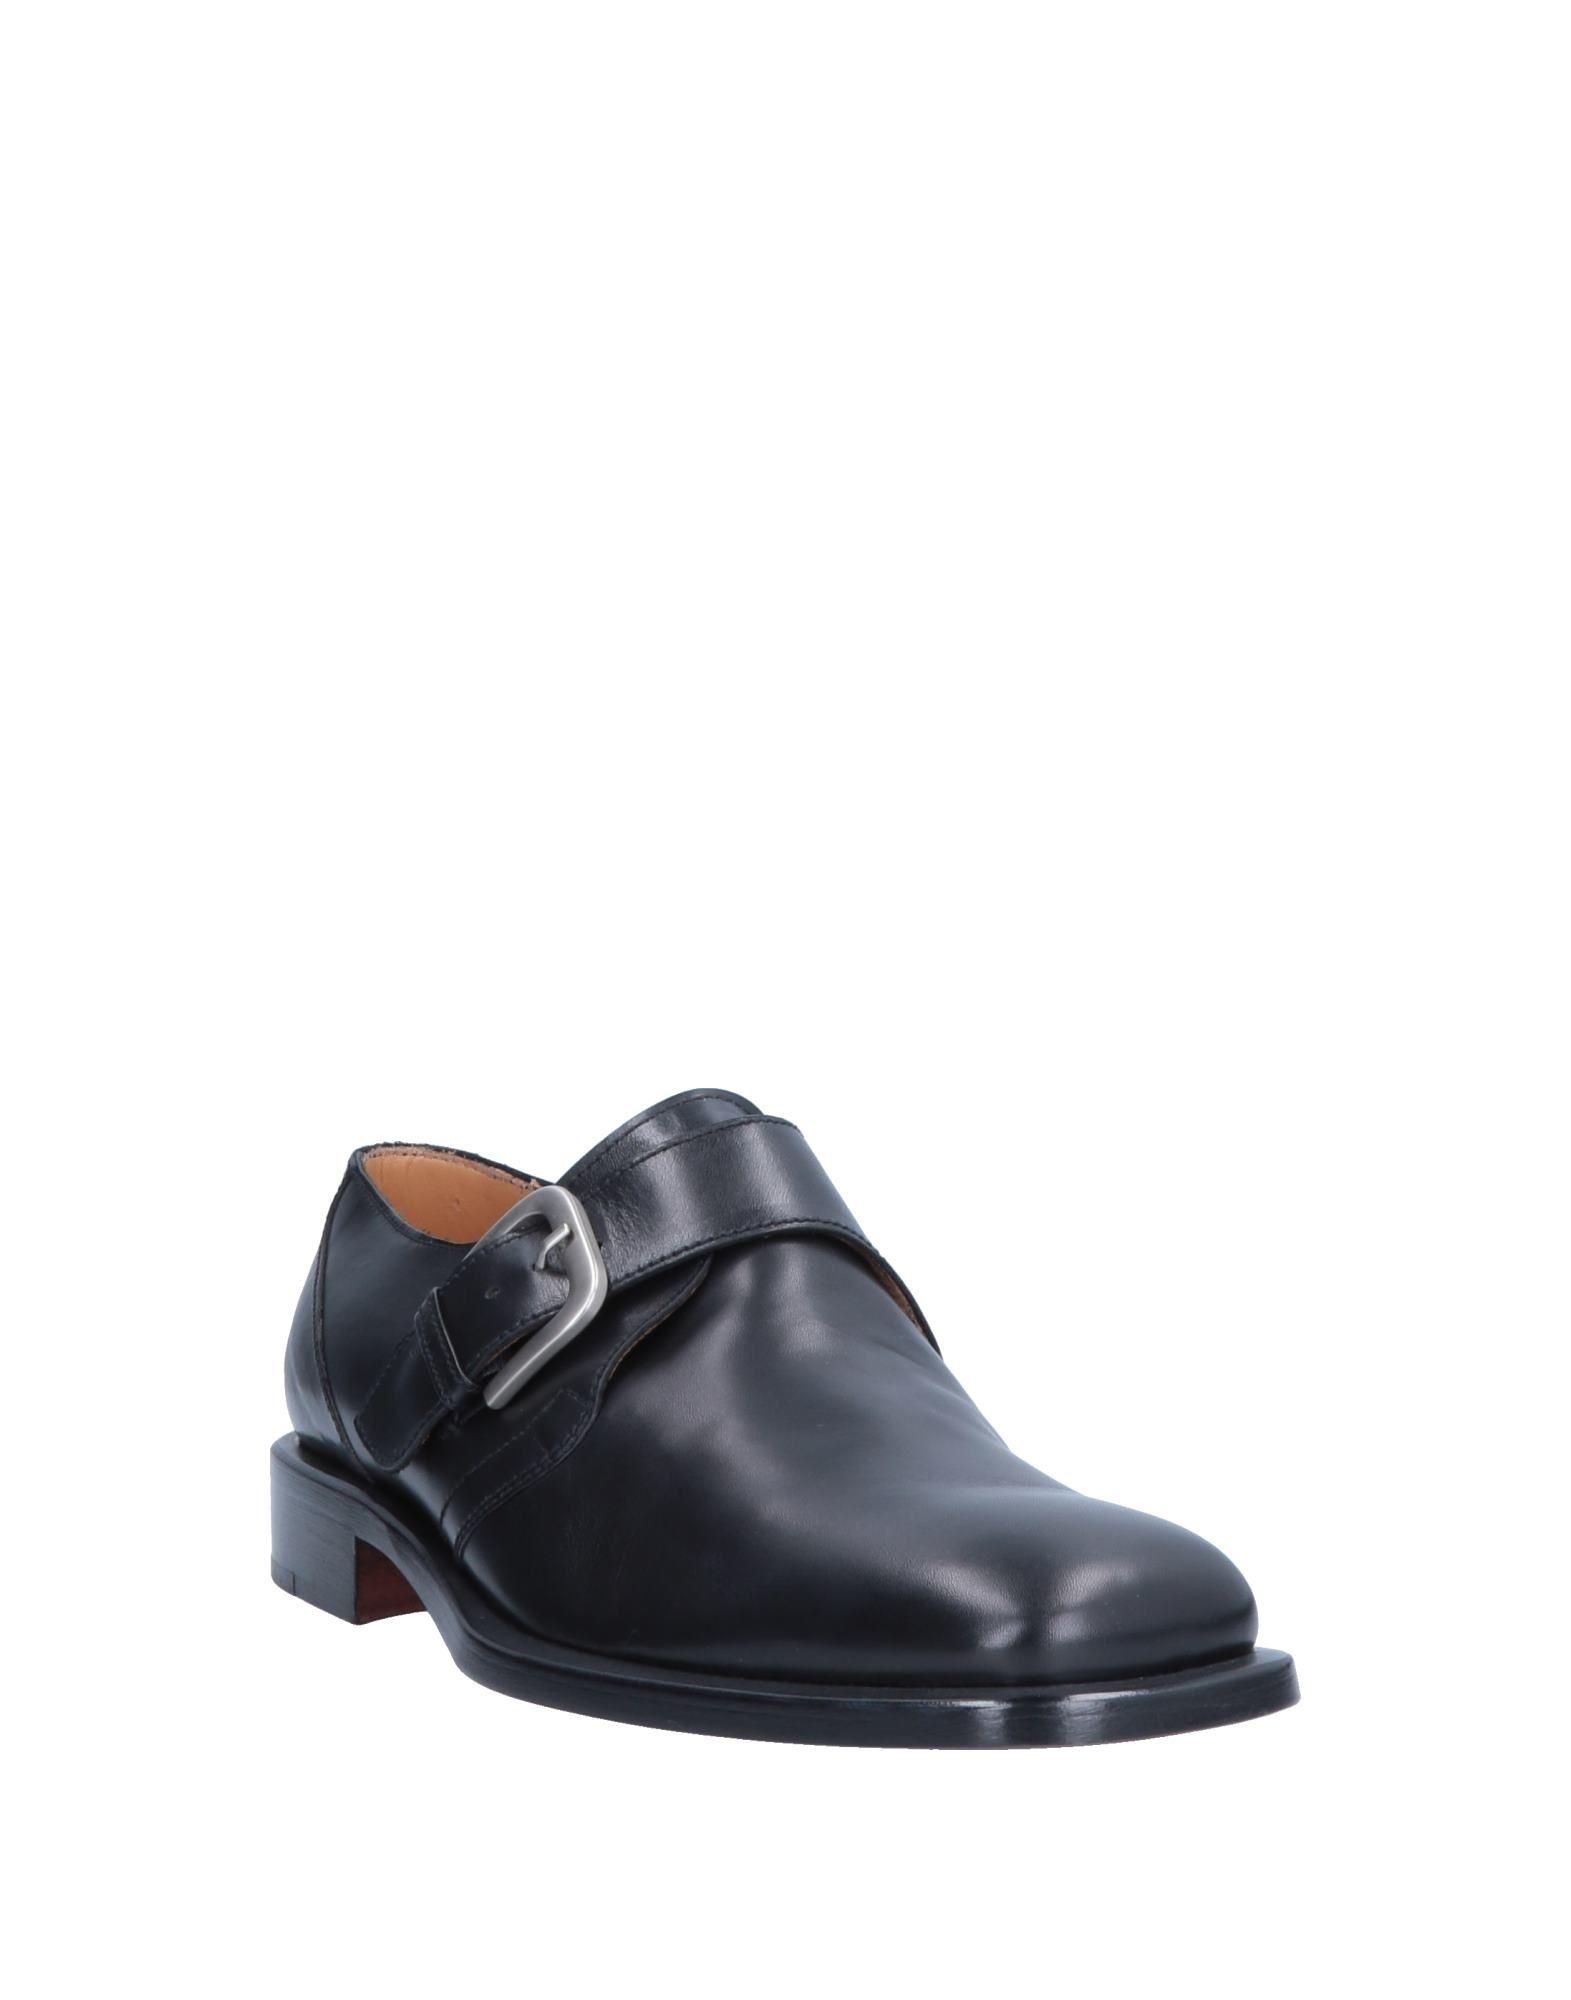 Campanile 11557444GW Mokassins Herren  11557444GW Campanile Gute Qualität beliebte Schuhe 0a0c74